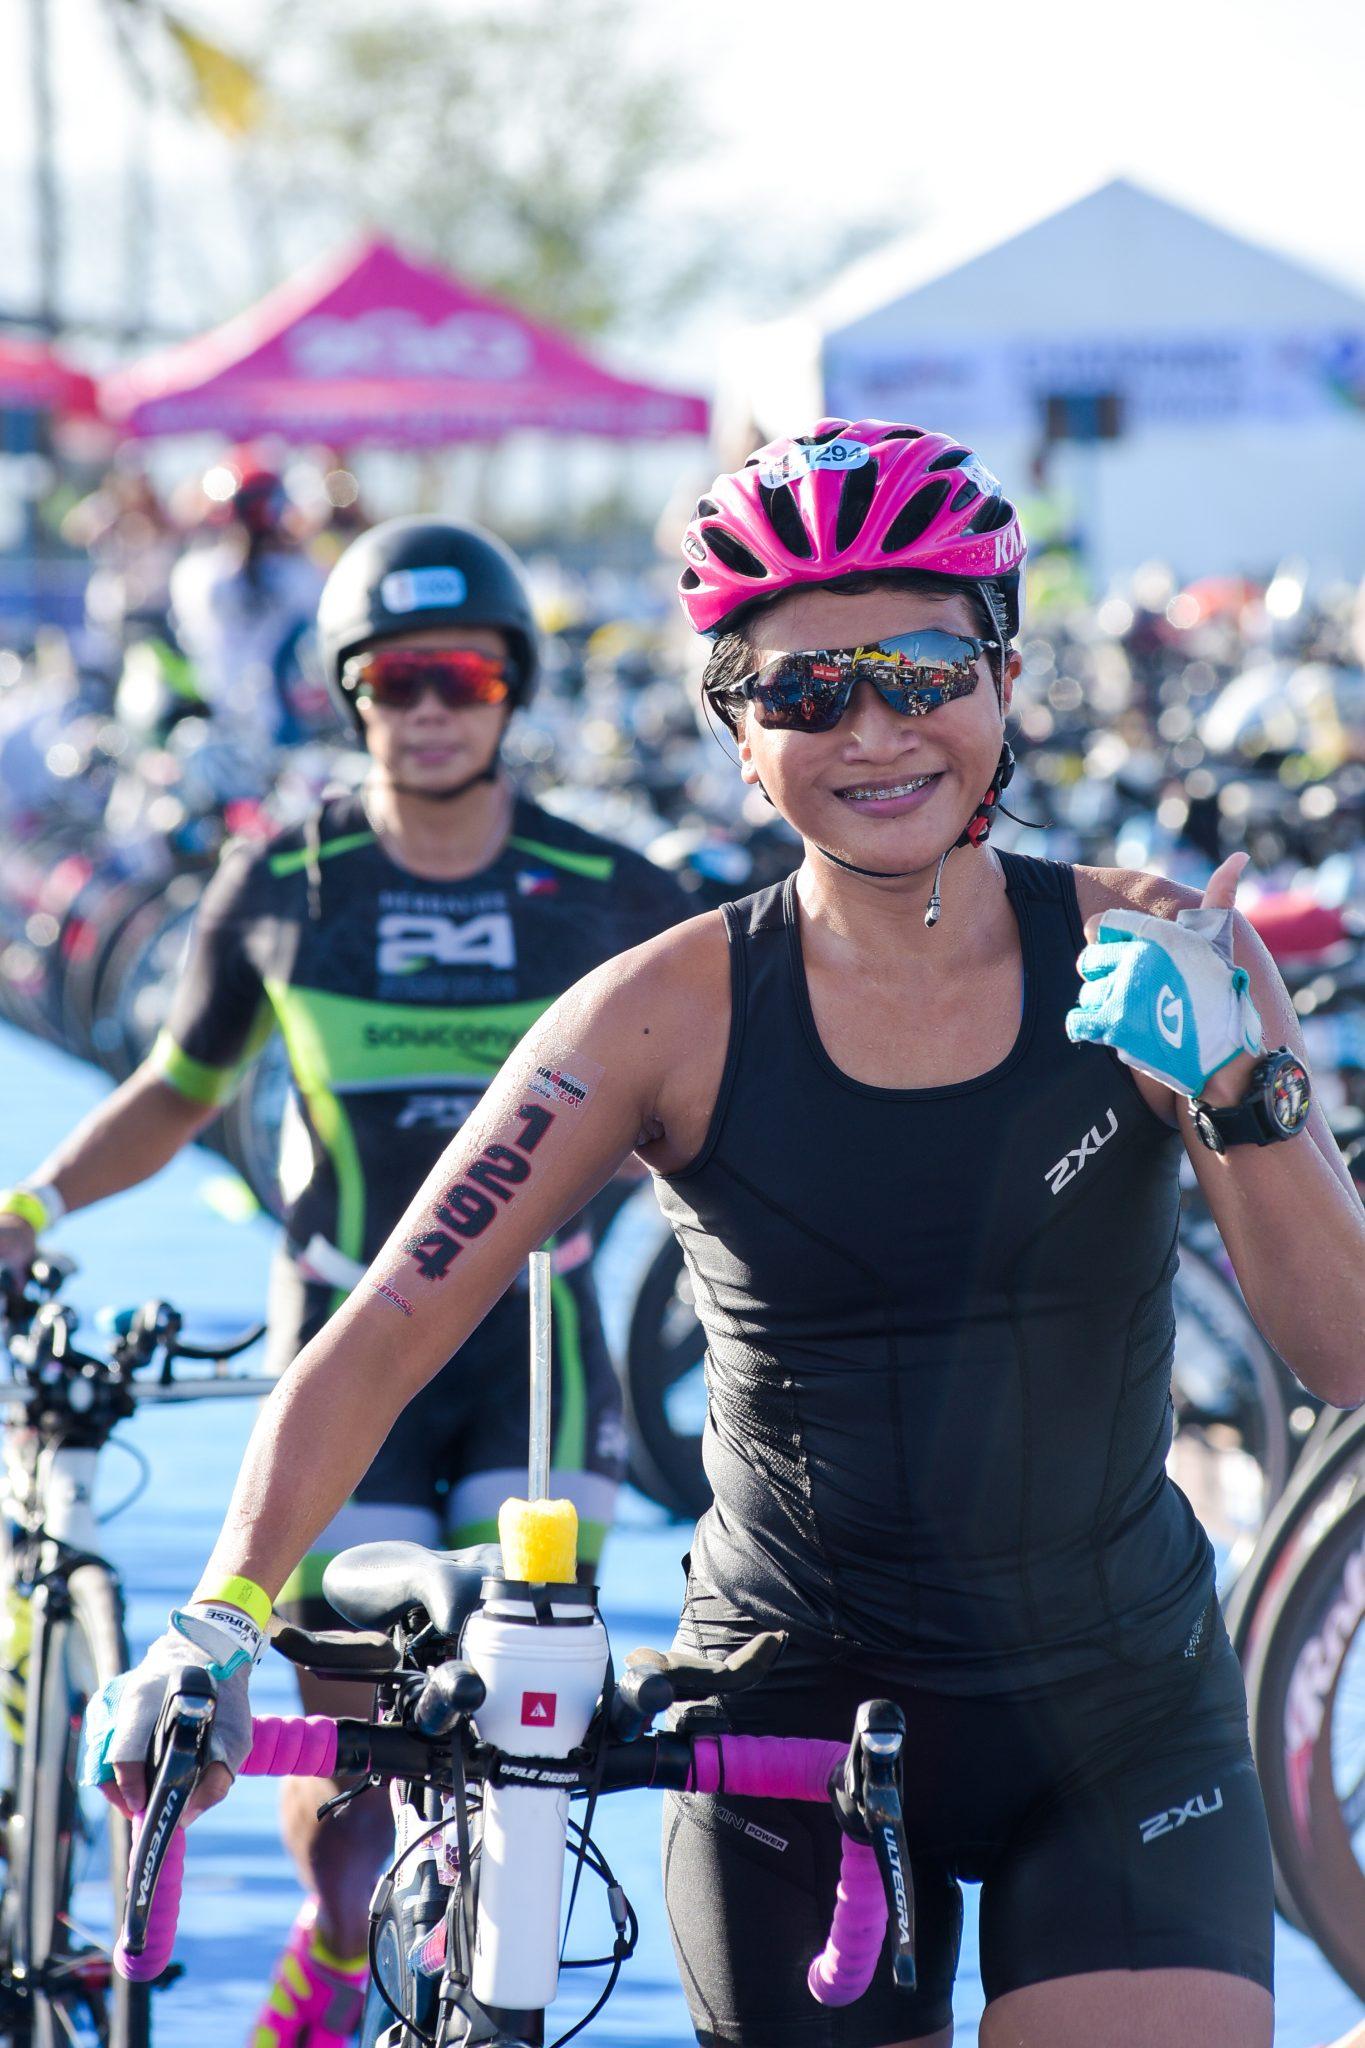 Gallery: Alveo Ironman 70.3 Davao